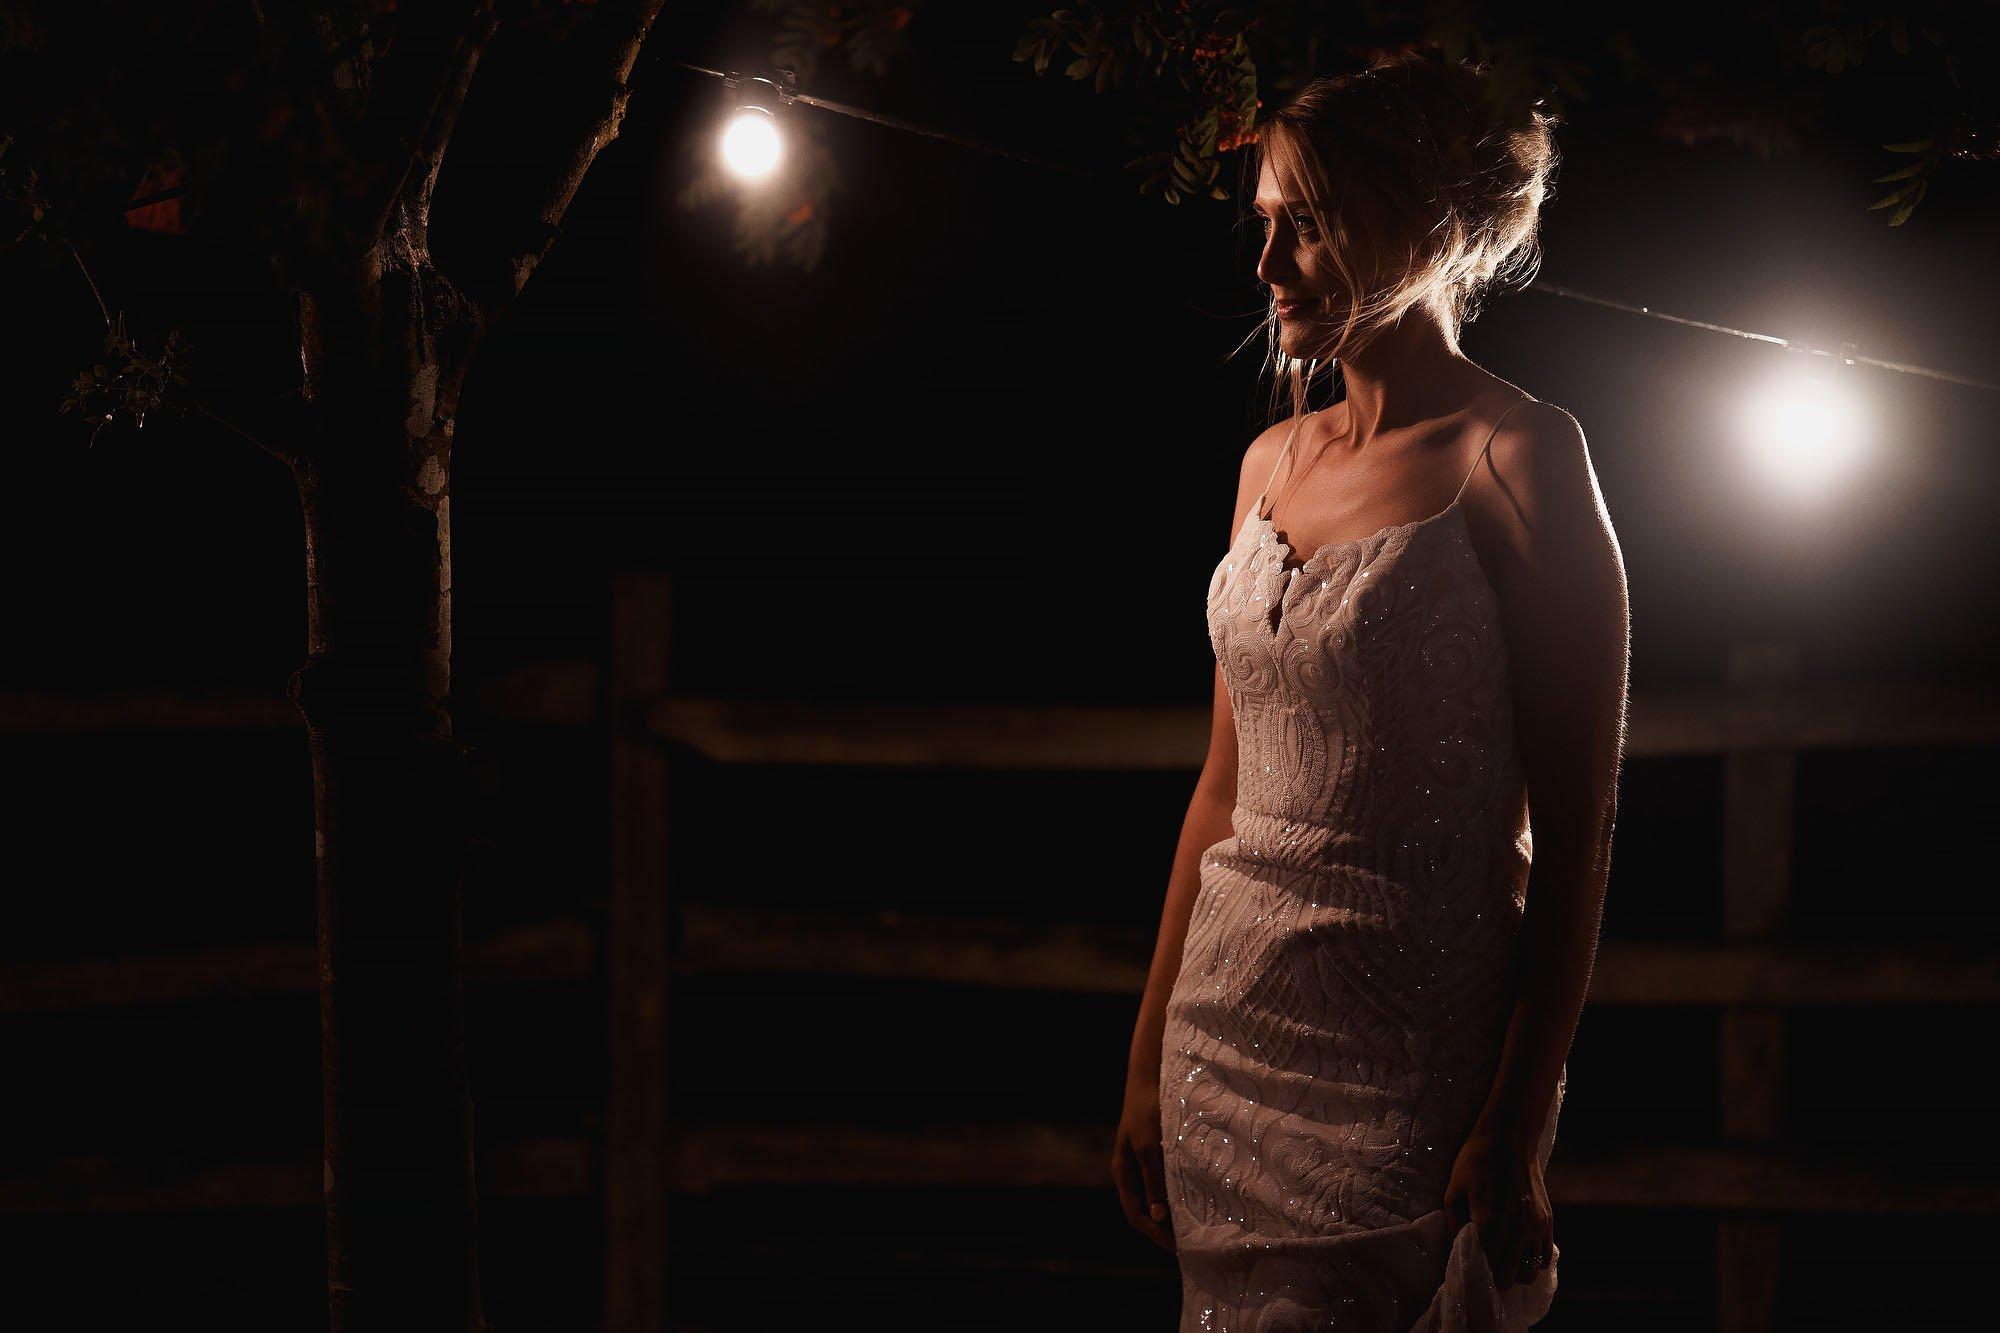 Northampton marquee wedding photography by arj photography